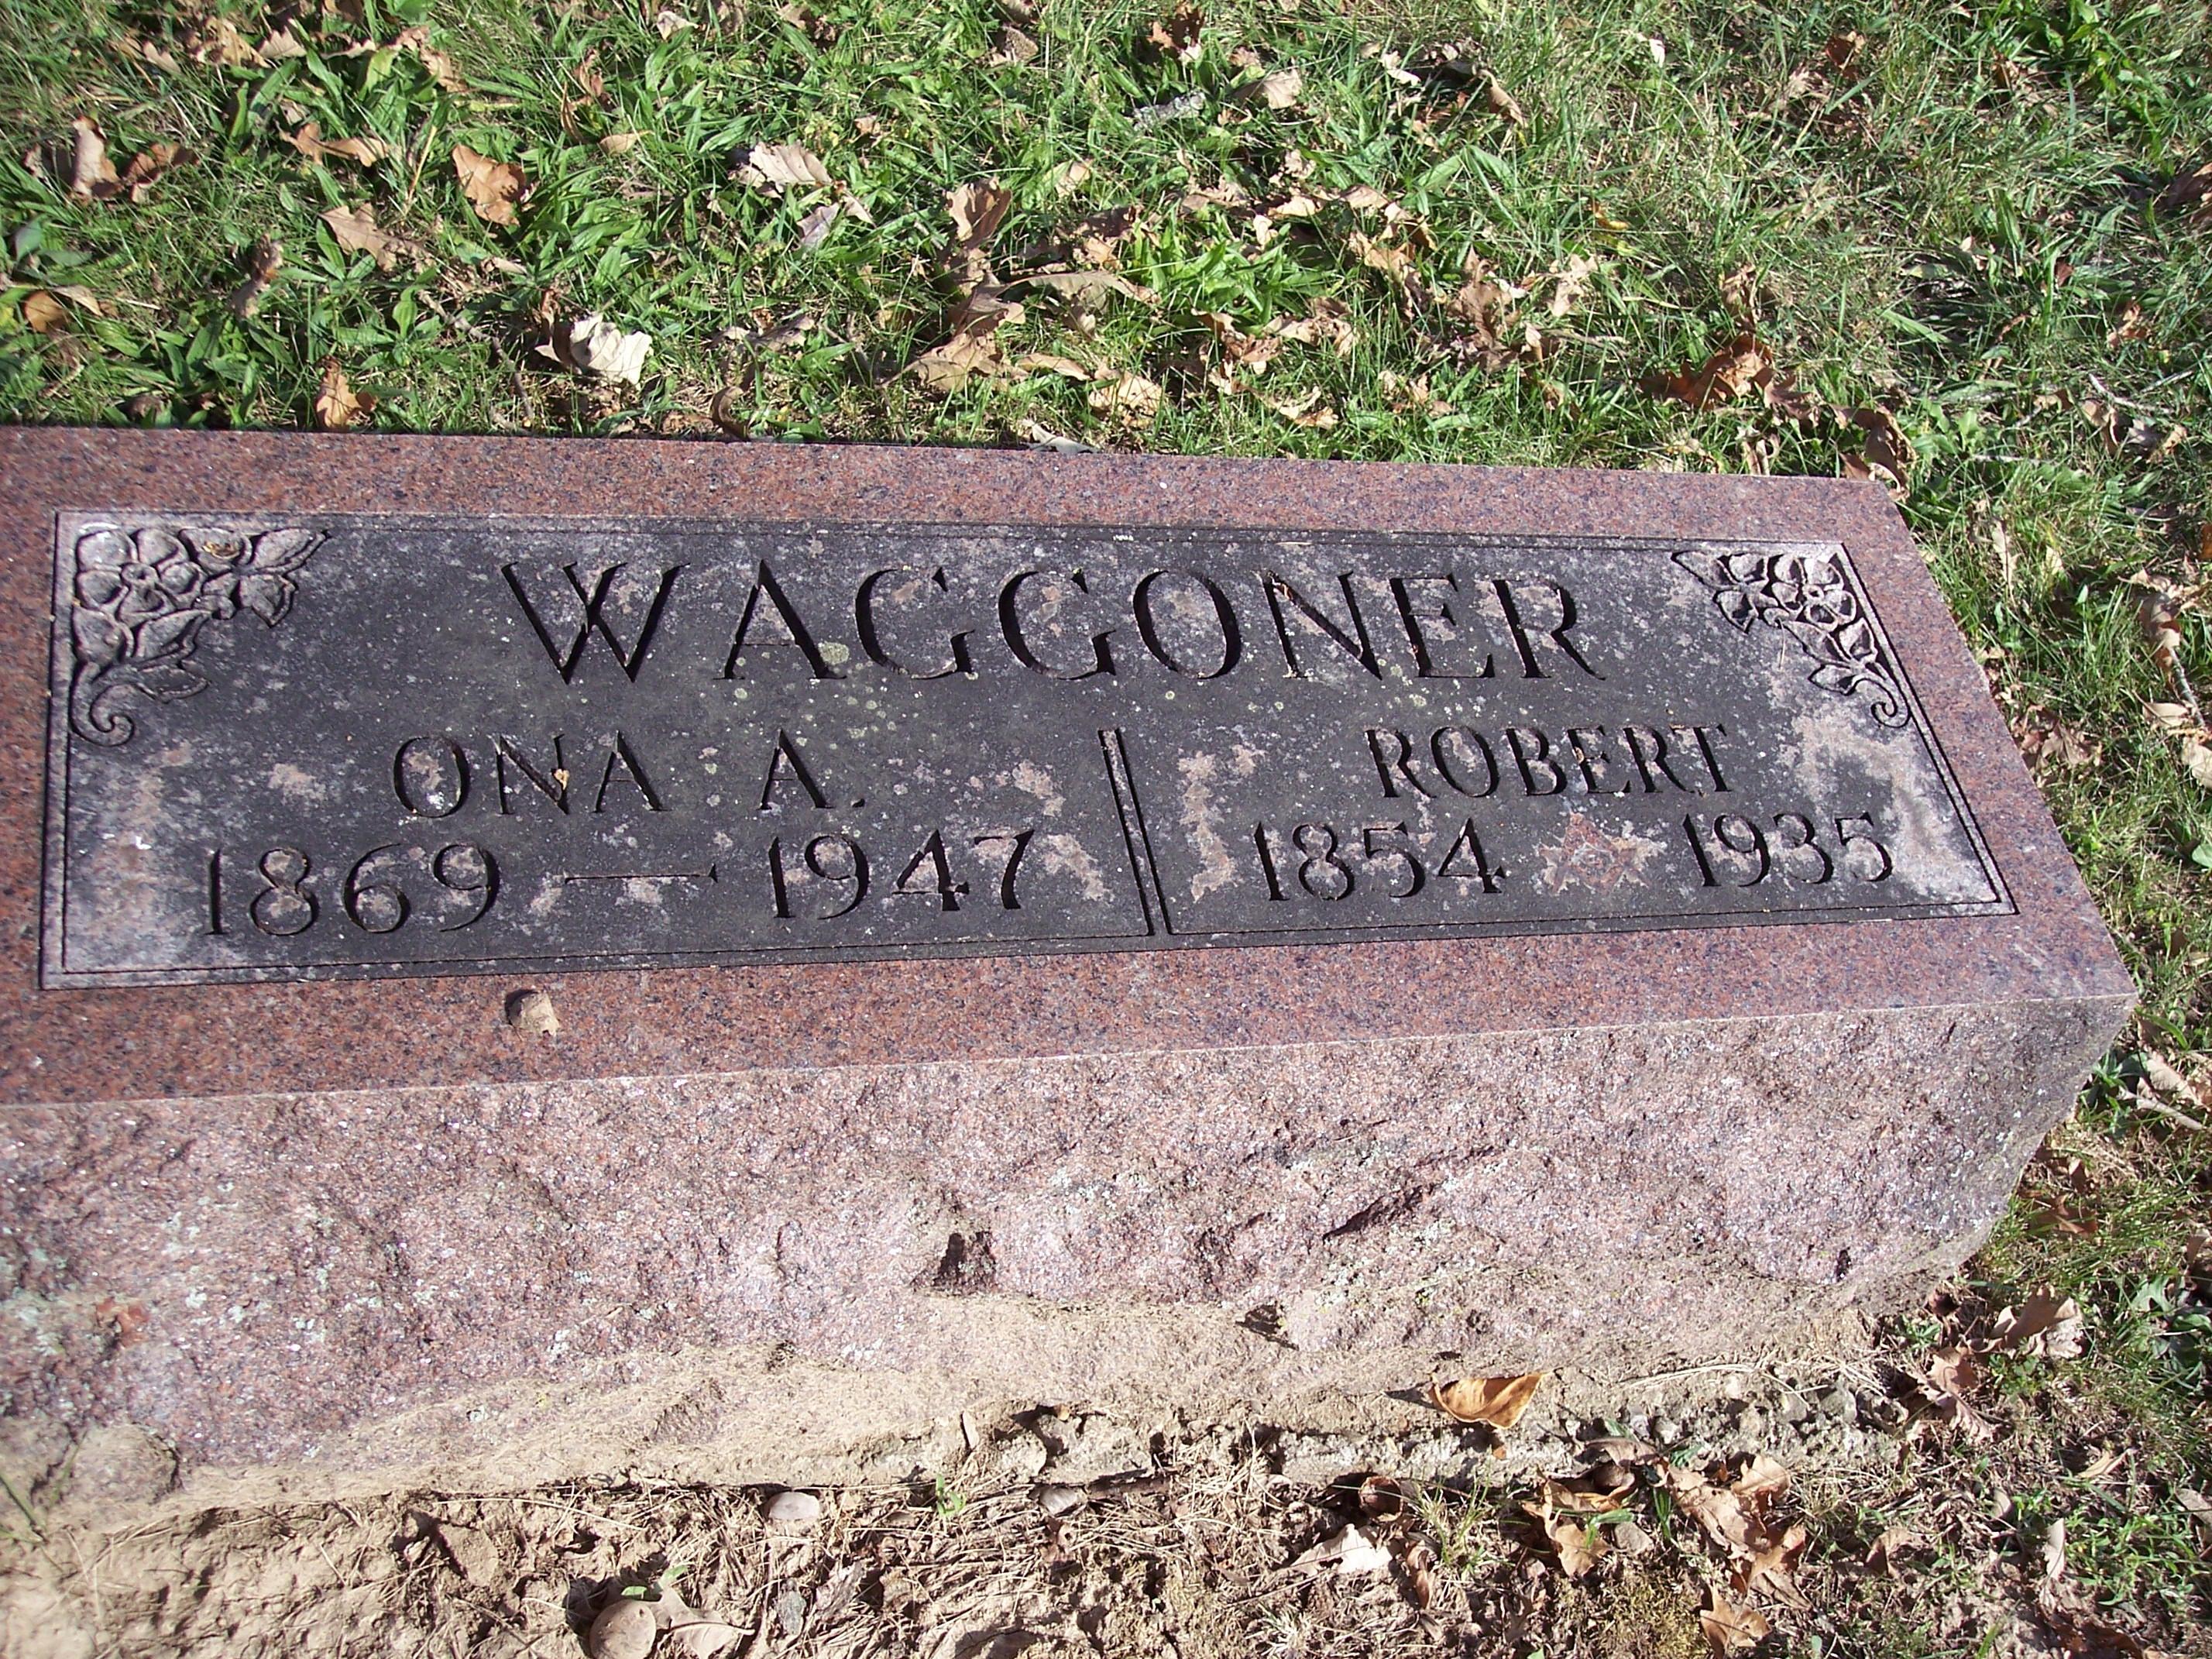 Robert L Waggoner